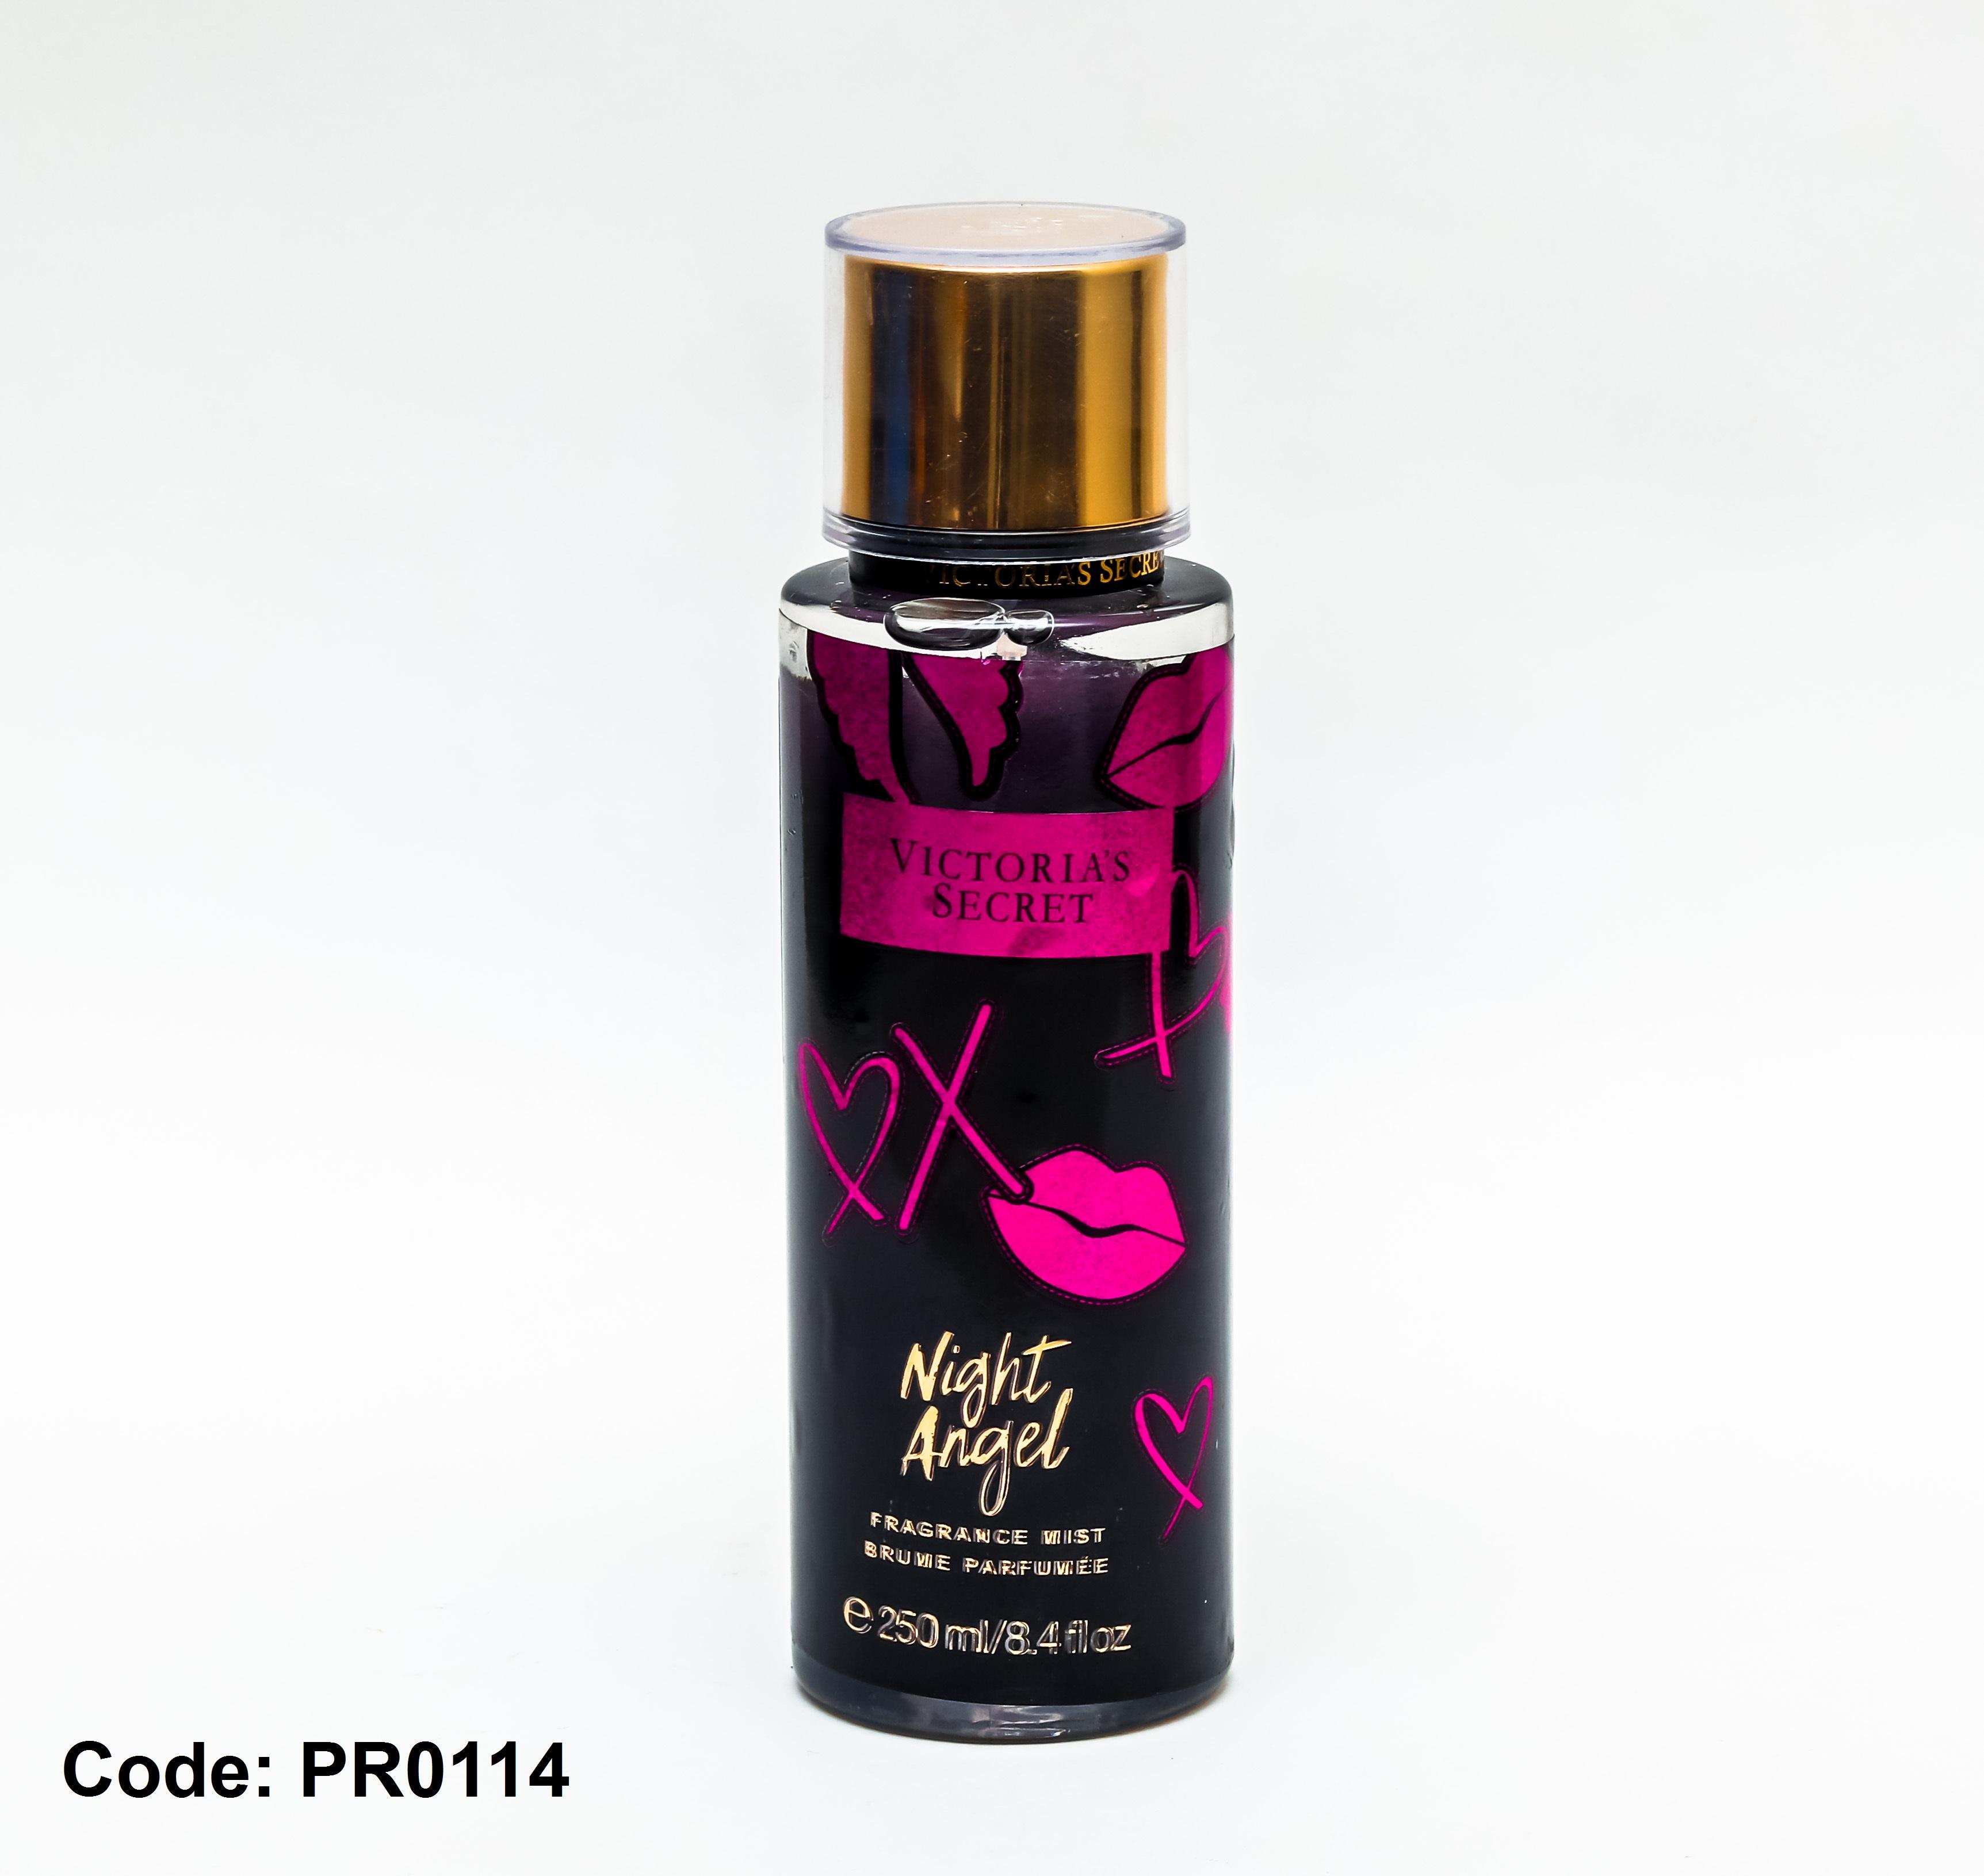 Victoria's secret (Body mist) NIGHT ANGEL copy